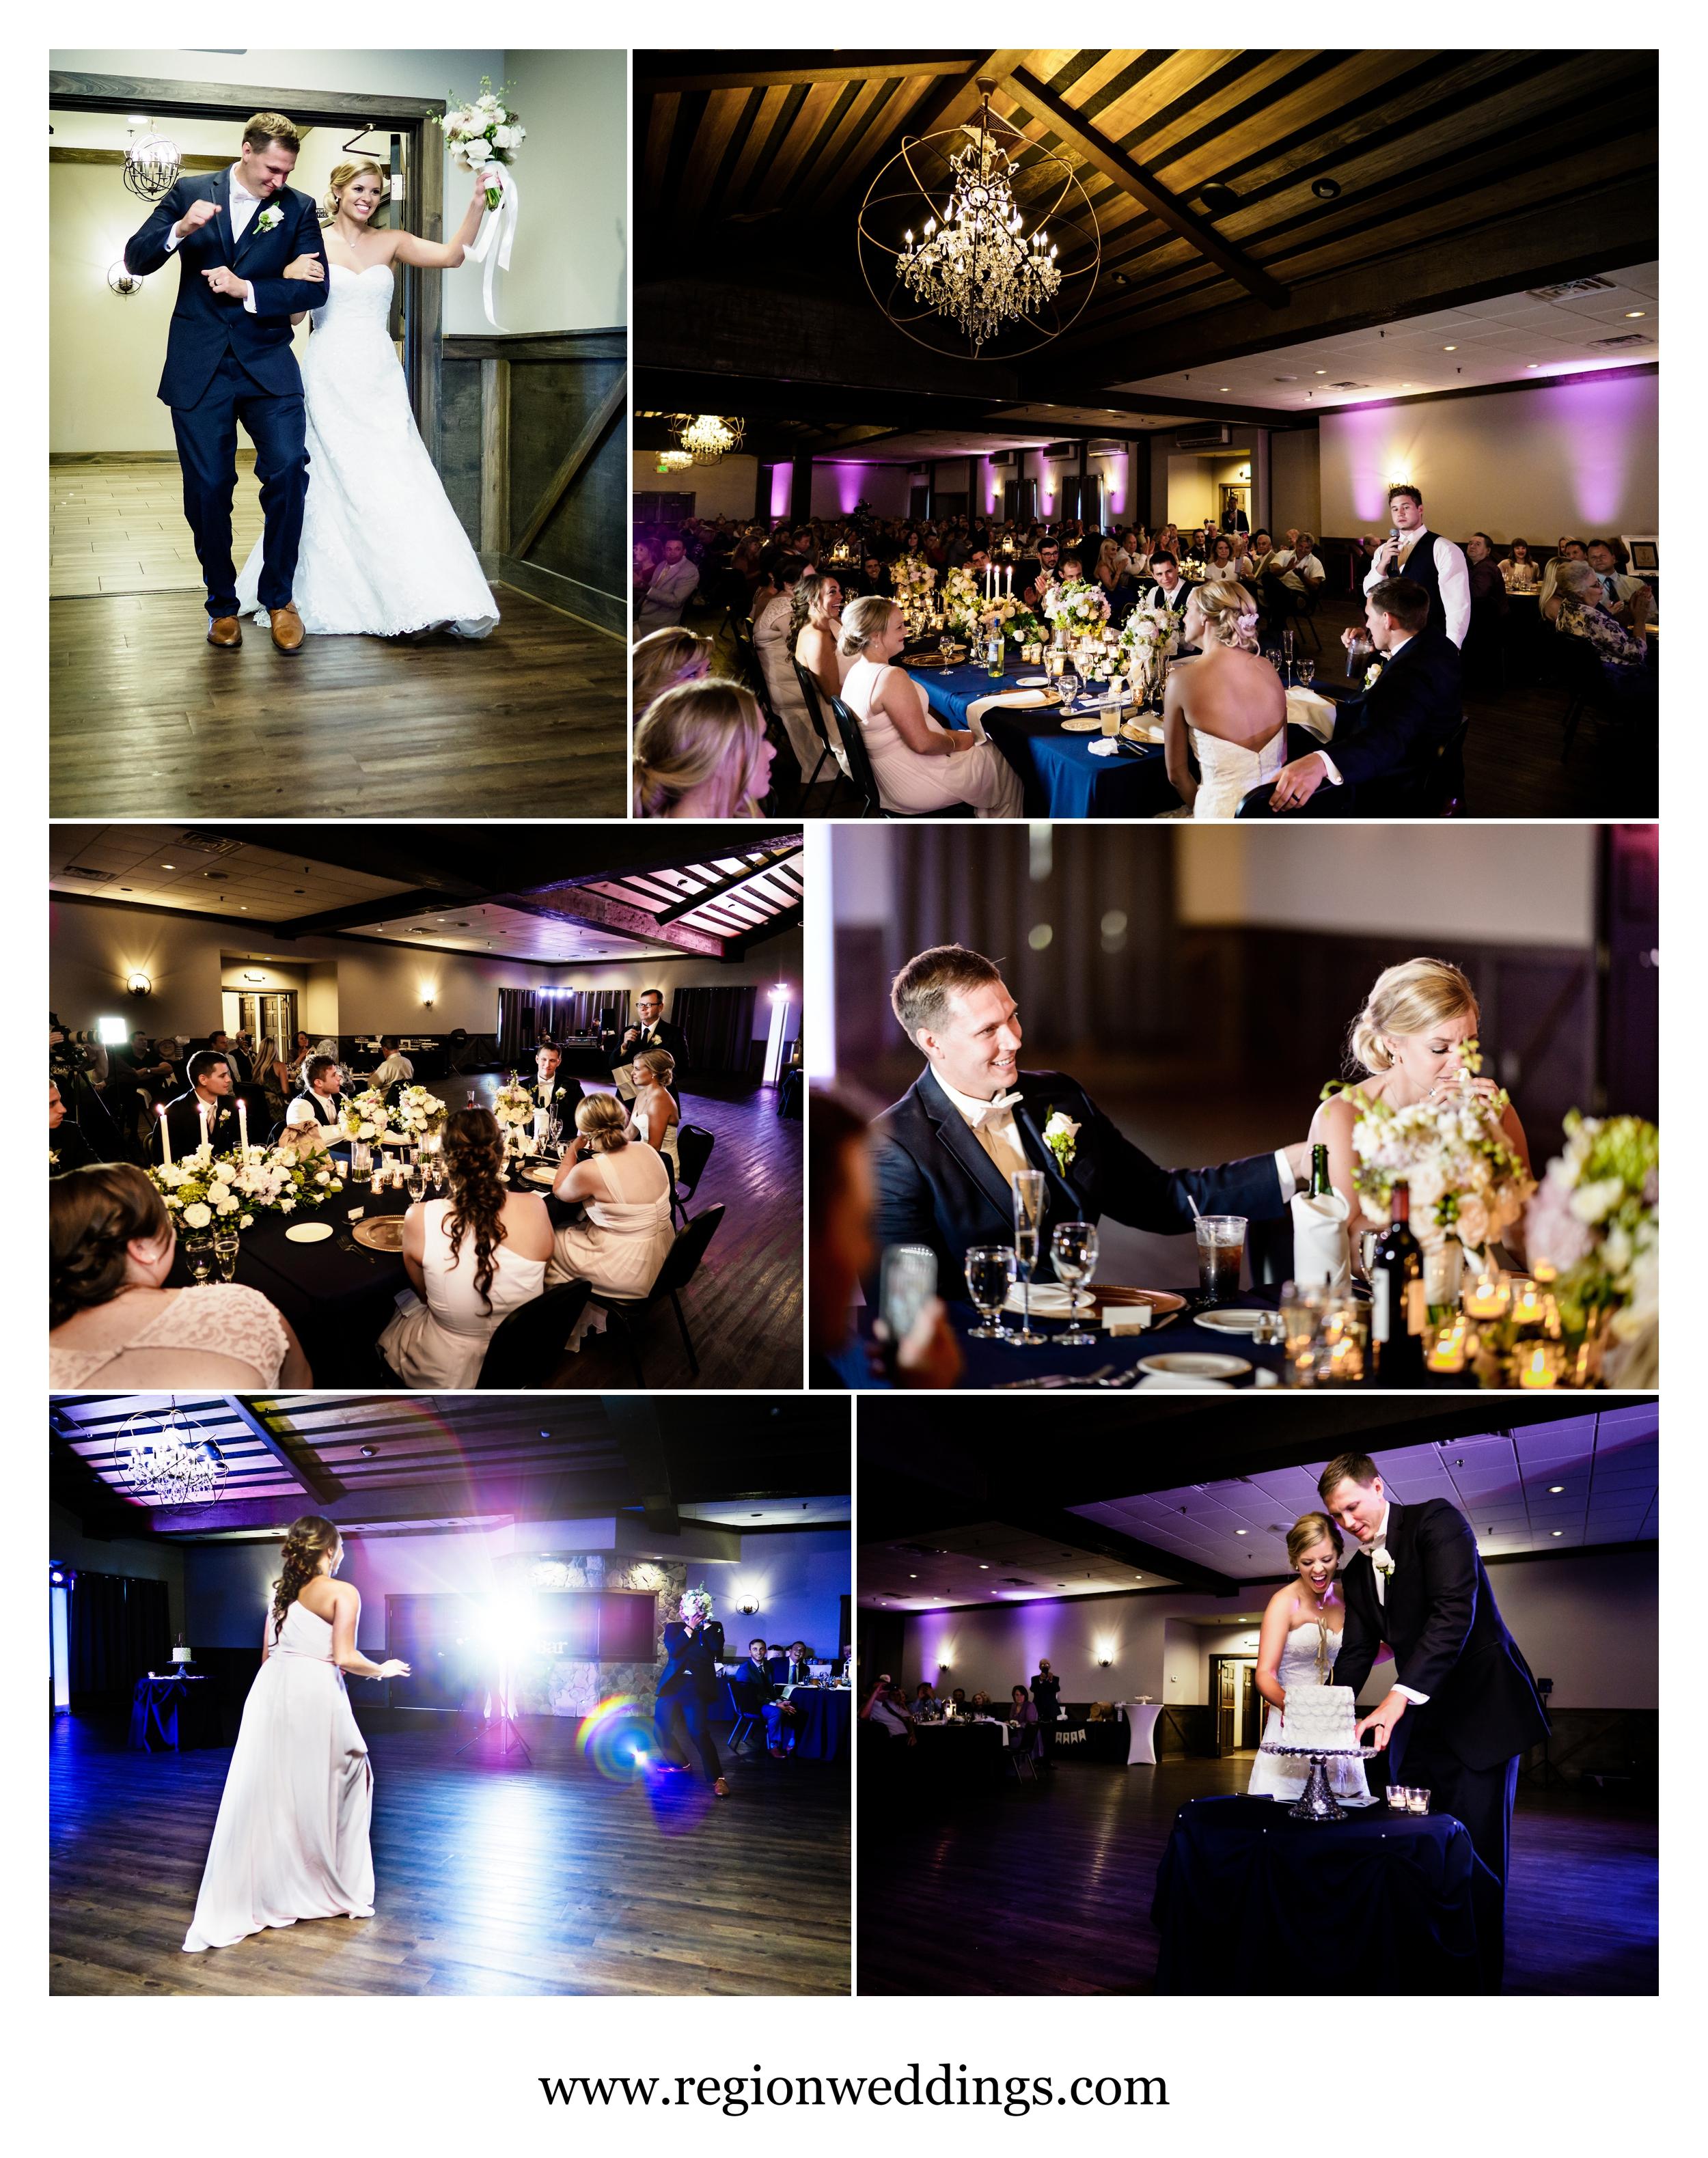 Wedding reception at The Market in Valparaiso, Indiana.